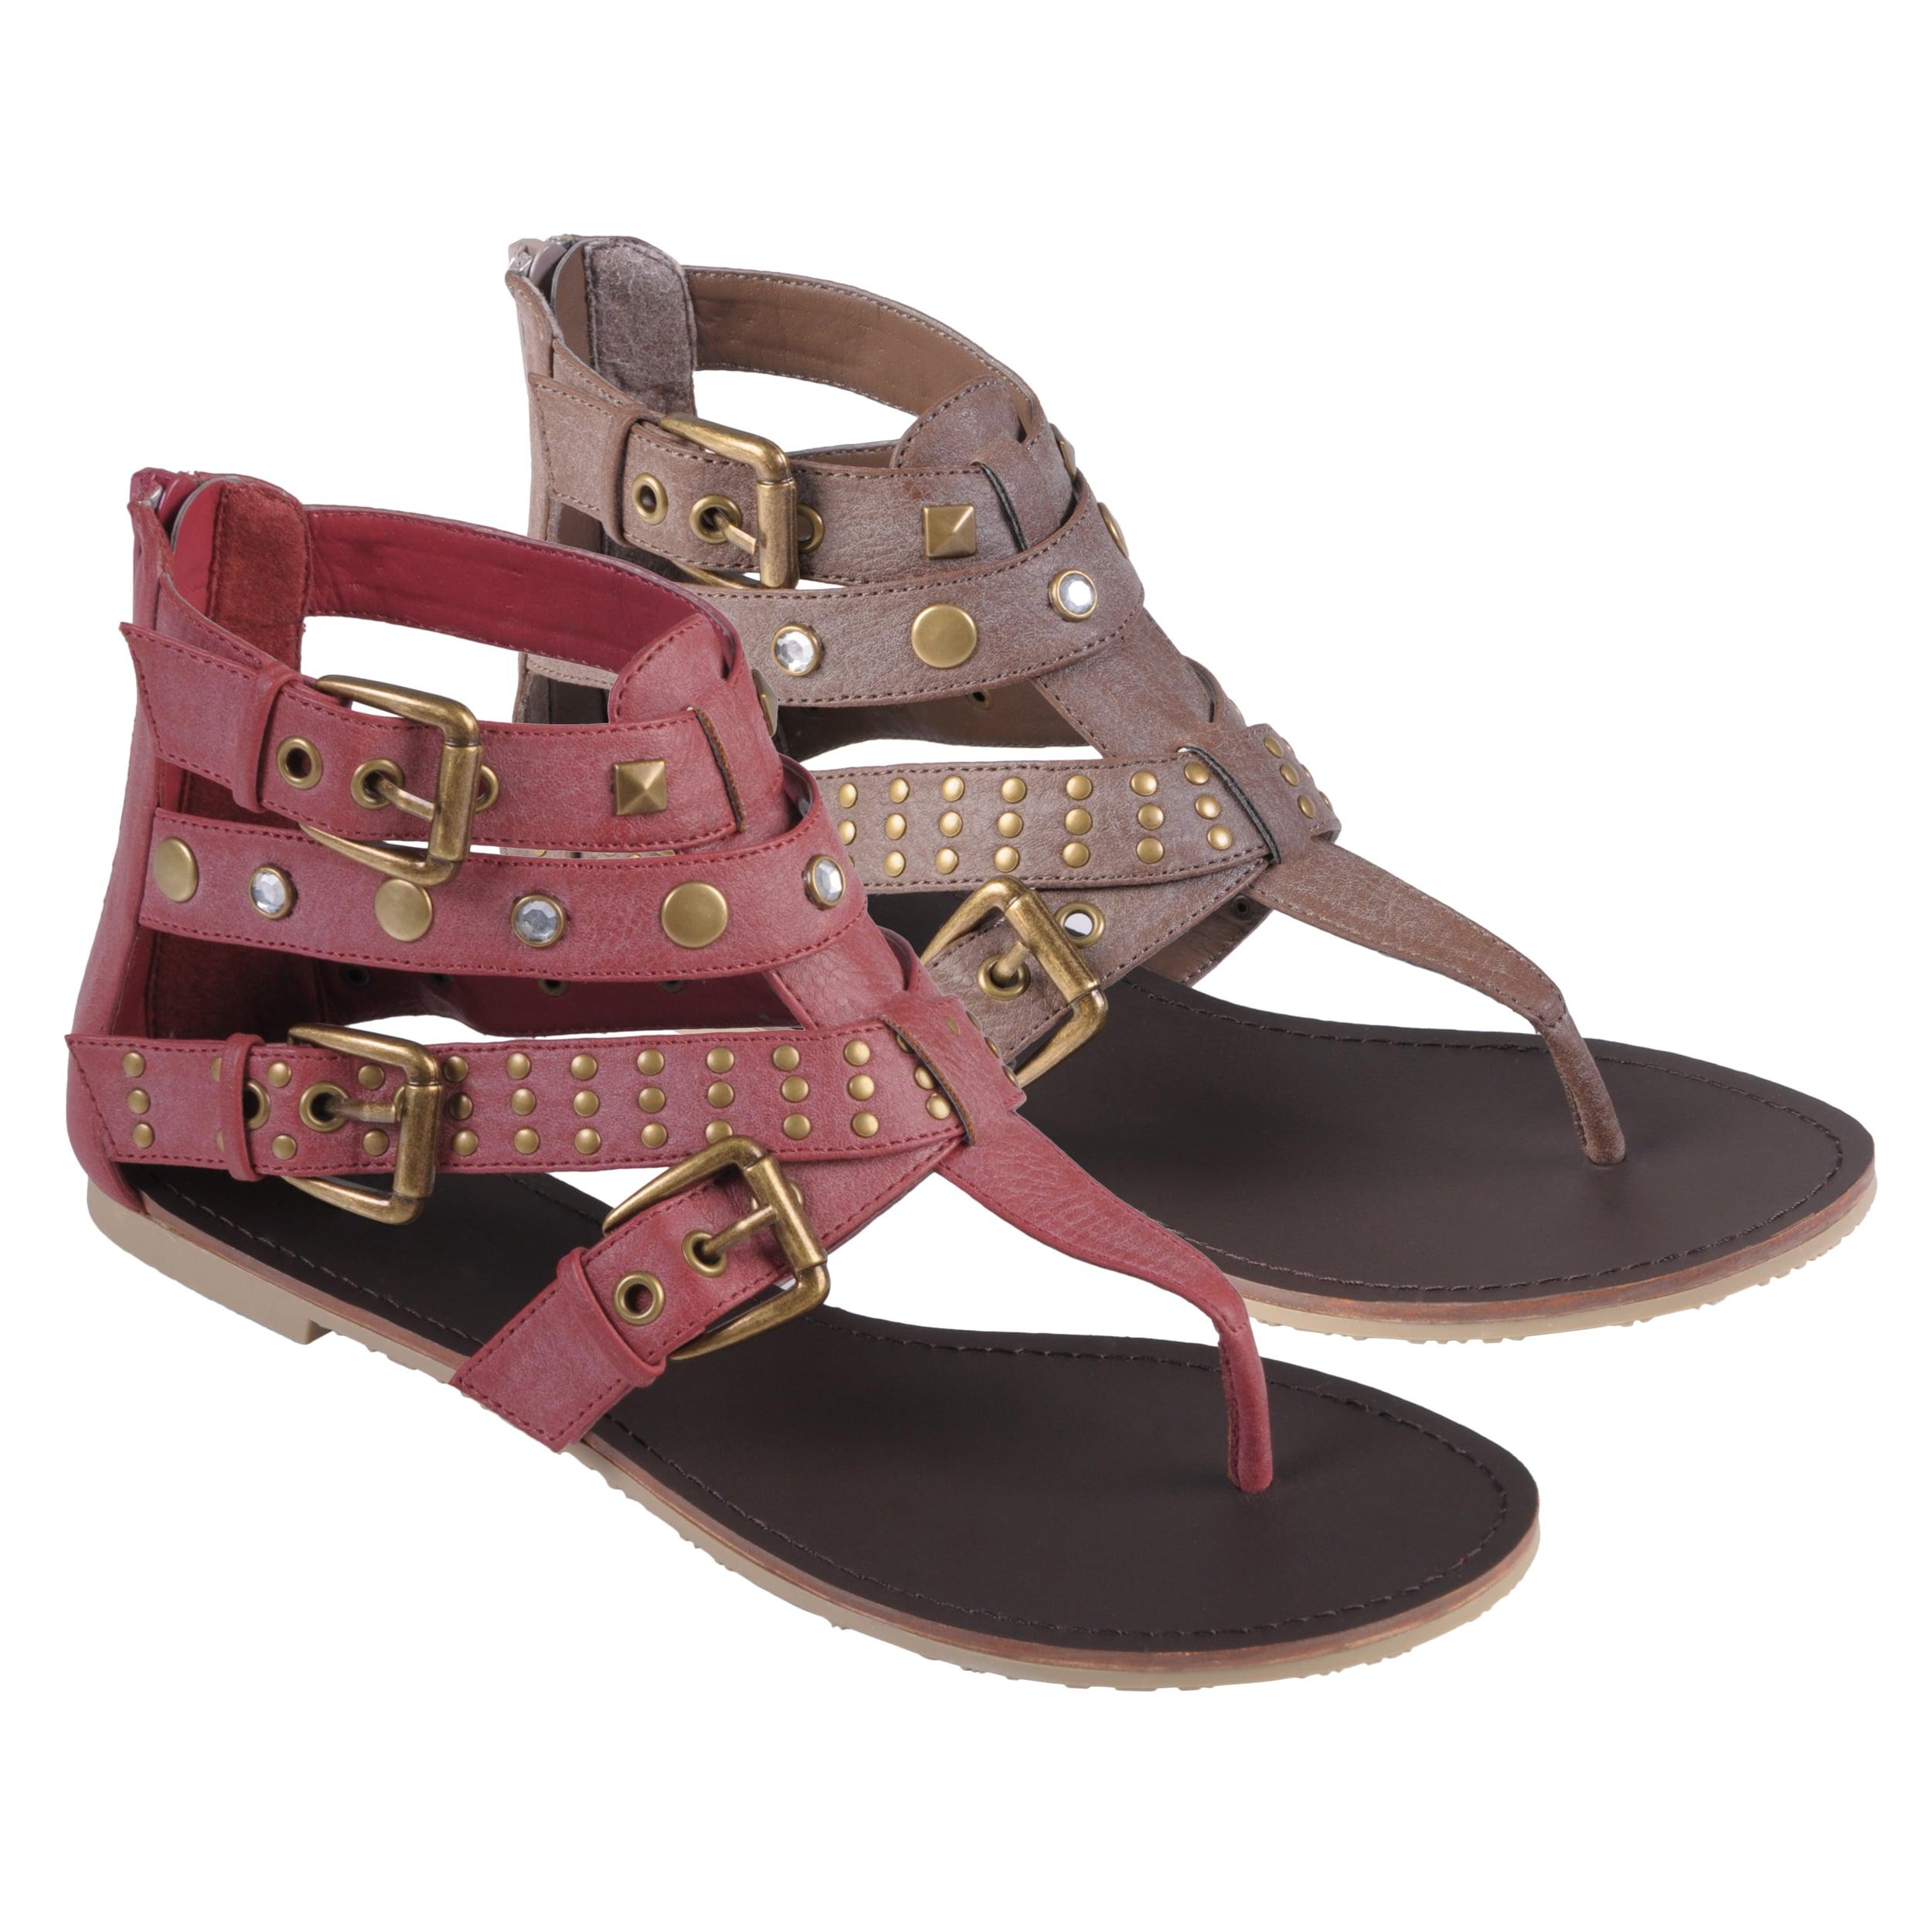 Journee Collection Women's 'Slick-37' T-strap Gladiator Sandals